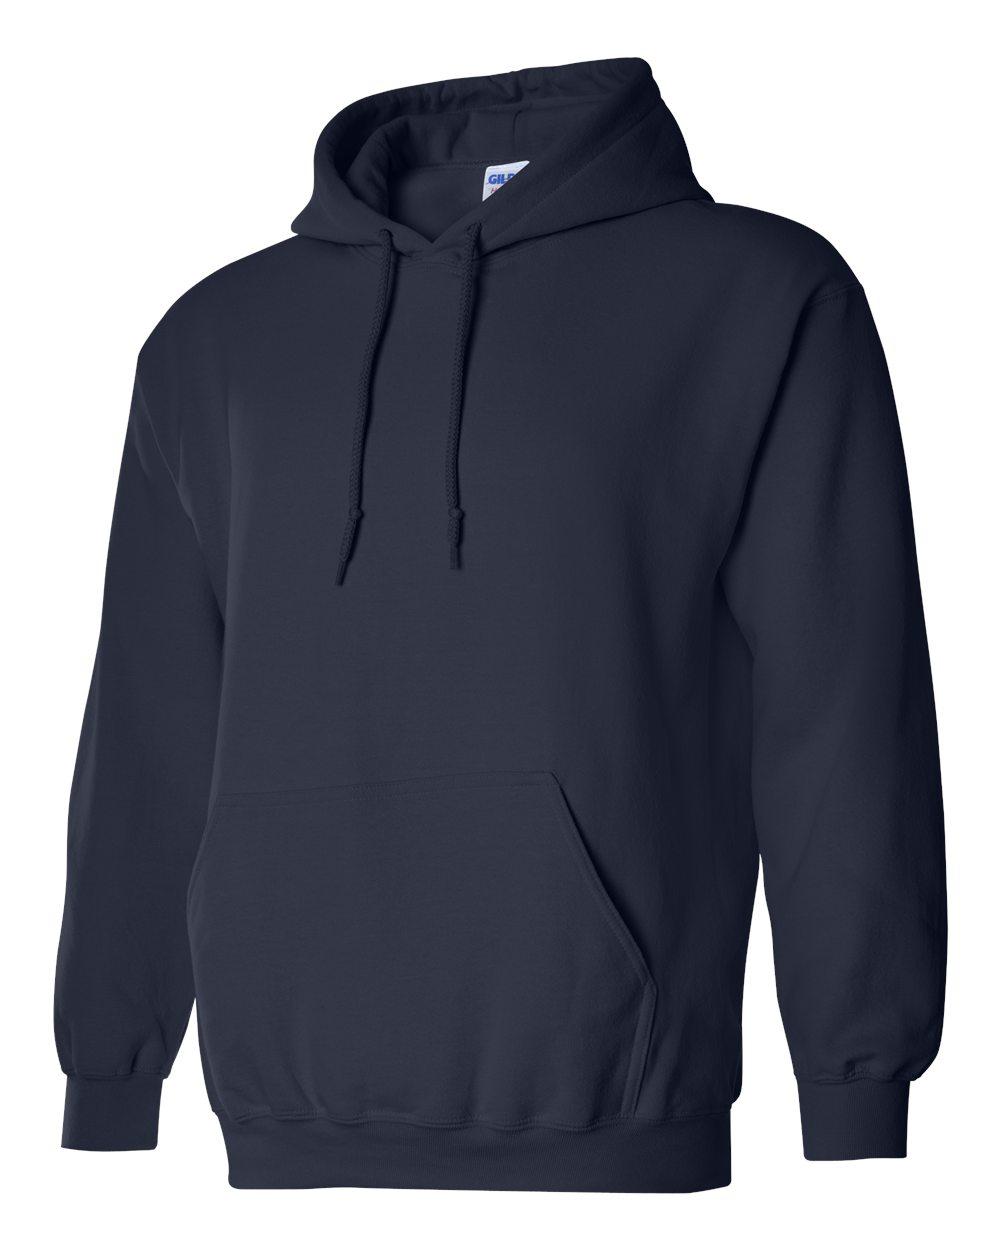 Gildan Heavy Blend Hooded Sweatshirt GI18500 Navy